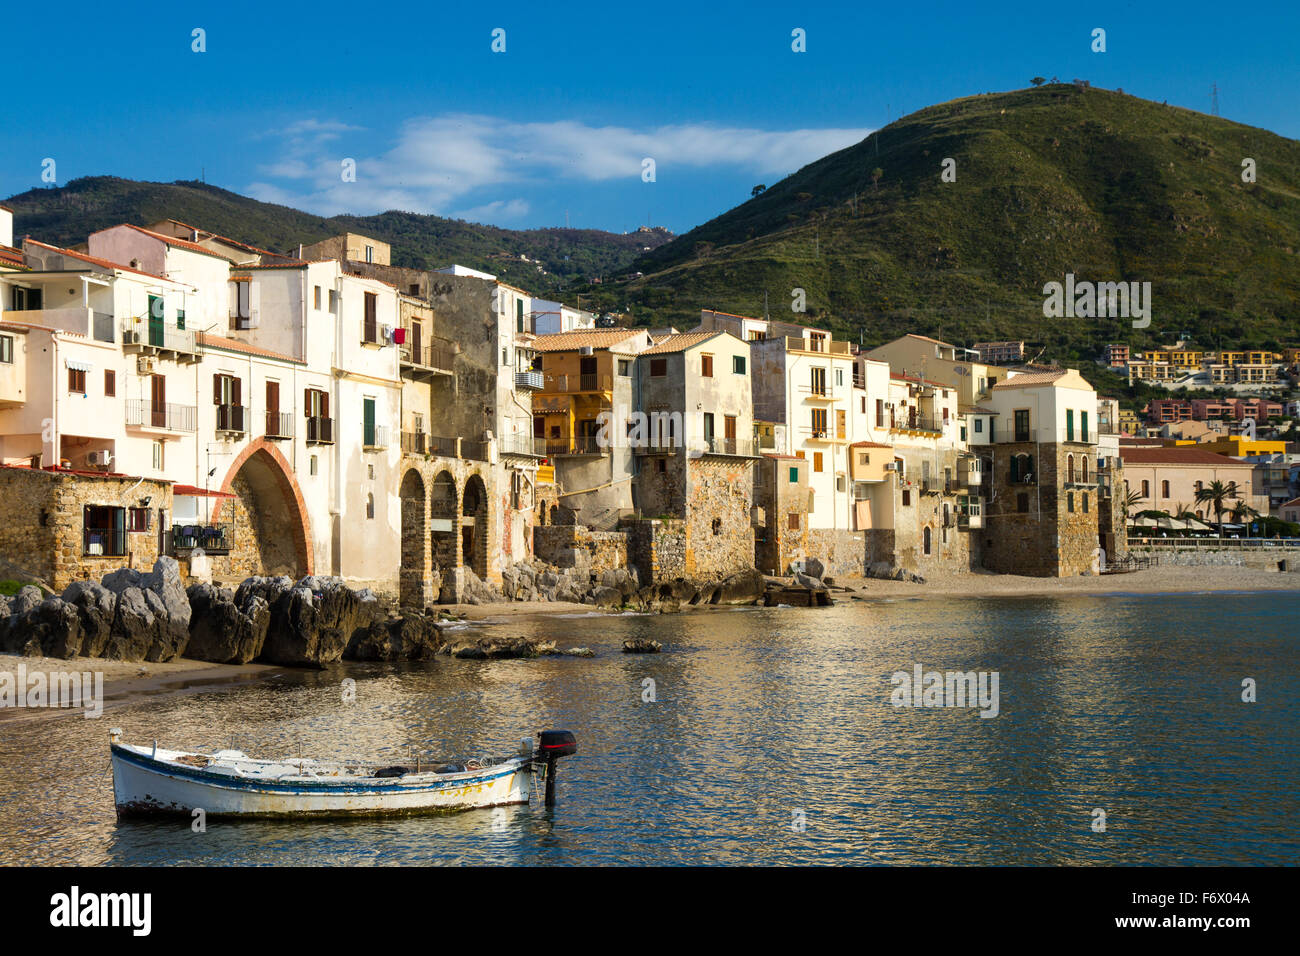 Harbor of Cefalu, Sicily, Italy - Stock Image